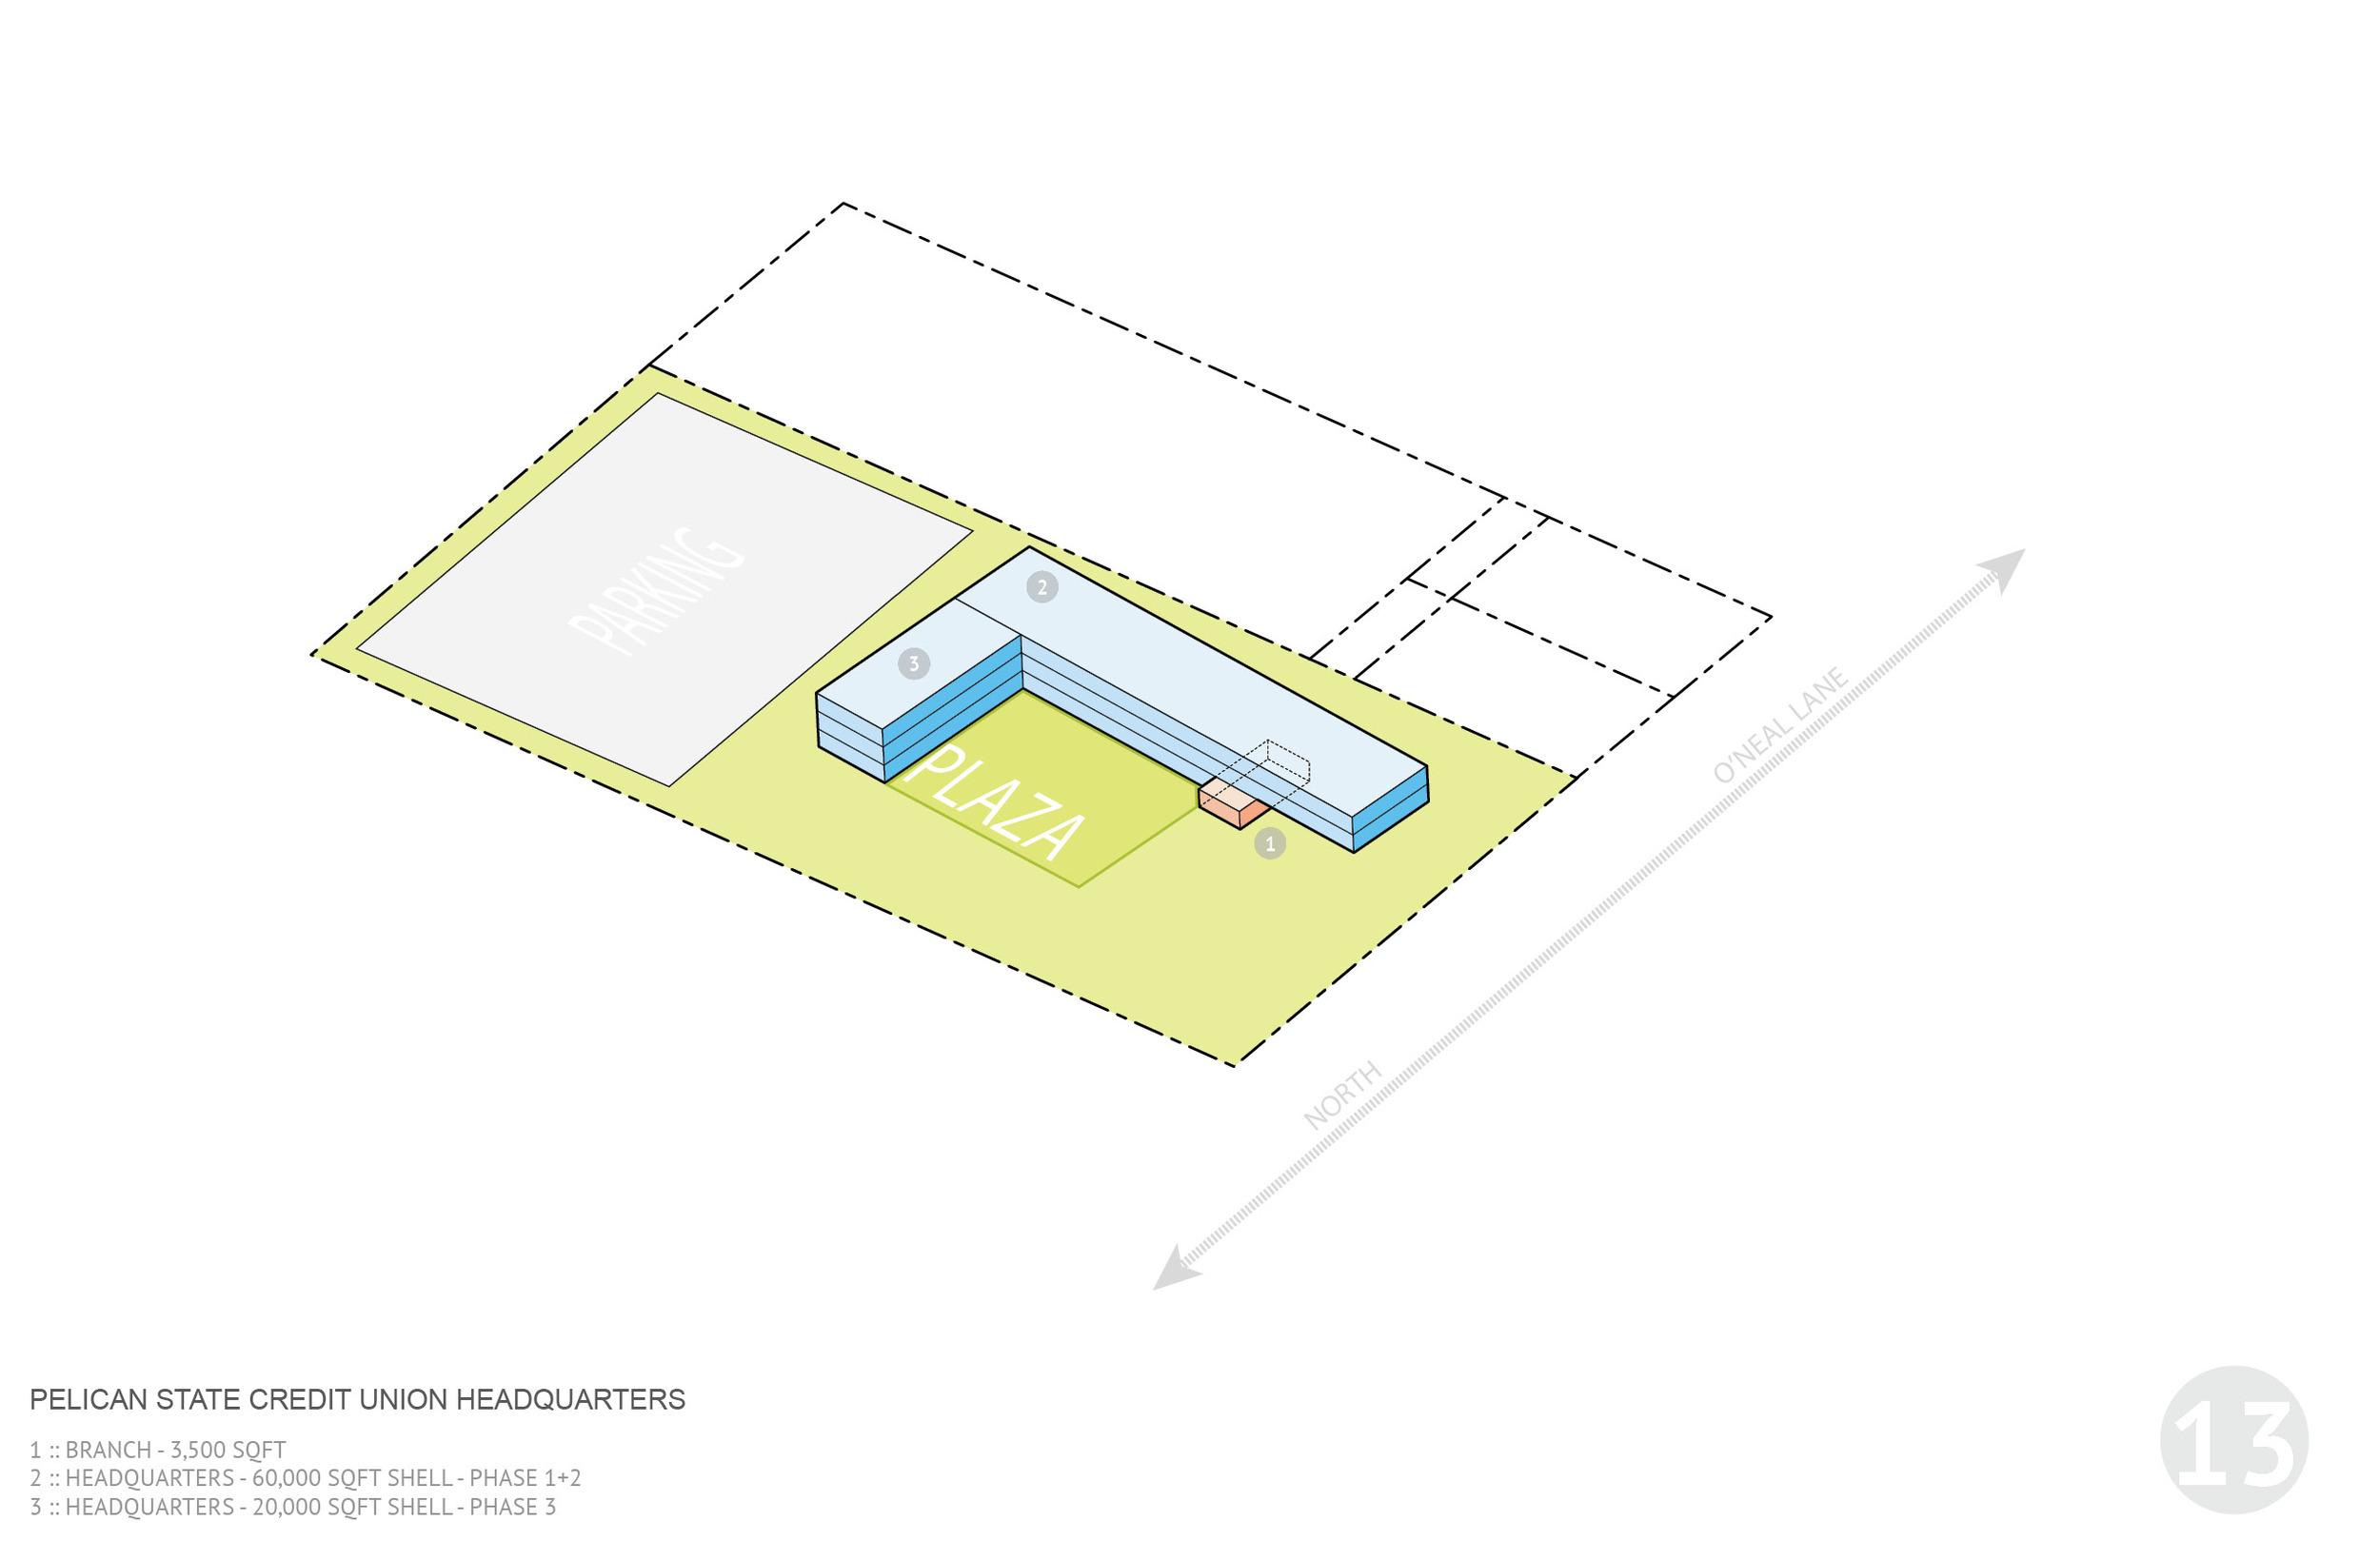 A_SlideshowDiagram_13.jpg